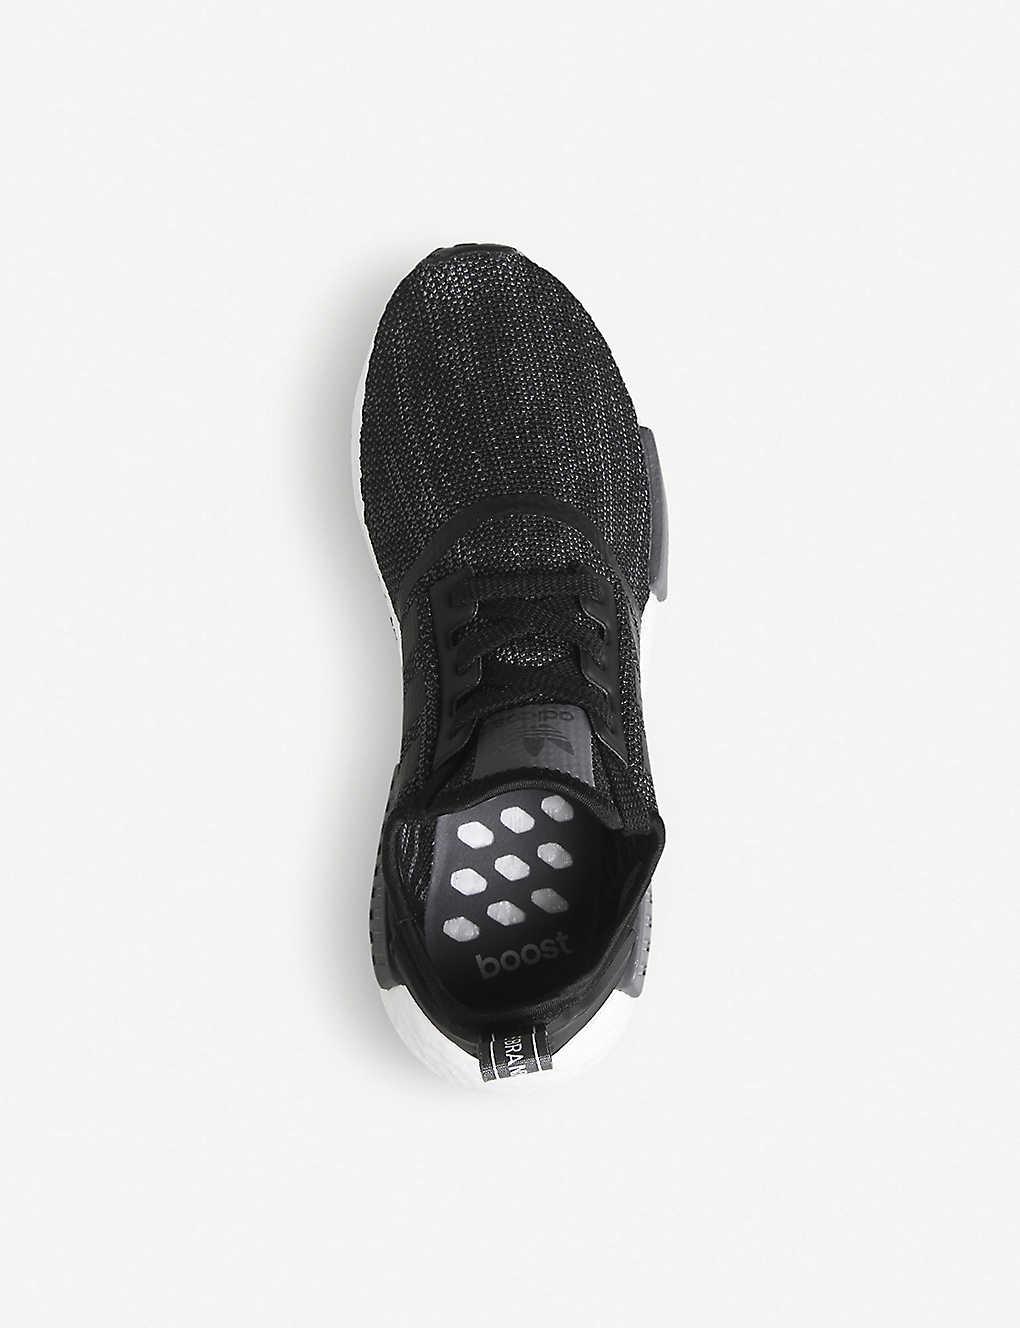 81cedd0a3a523 ... NMD R1 Primeknit trainers - Core black grey ...